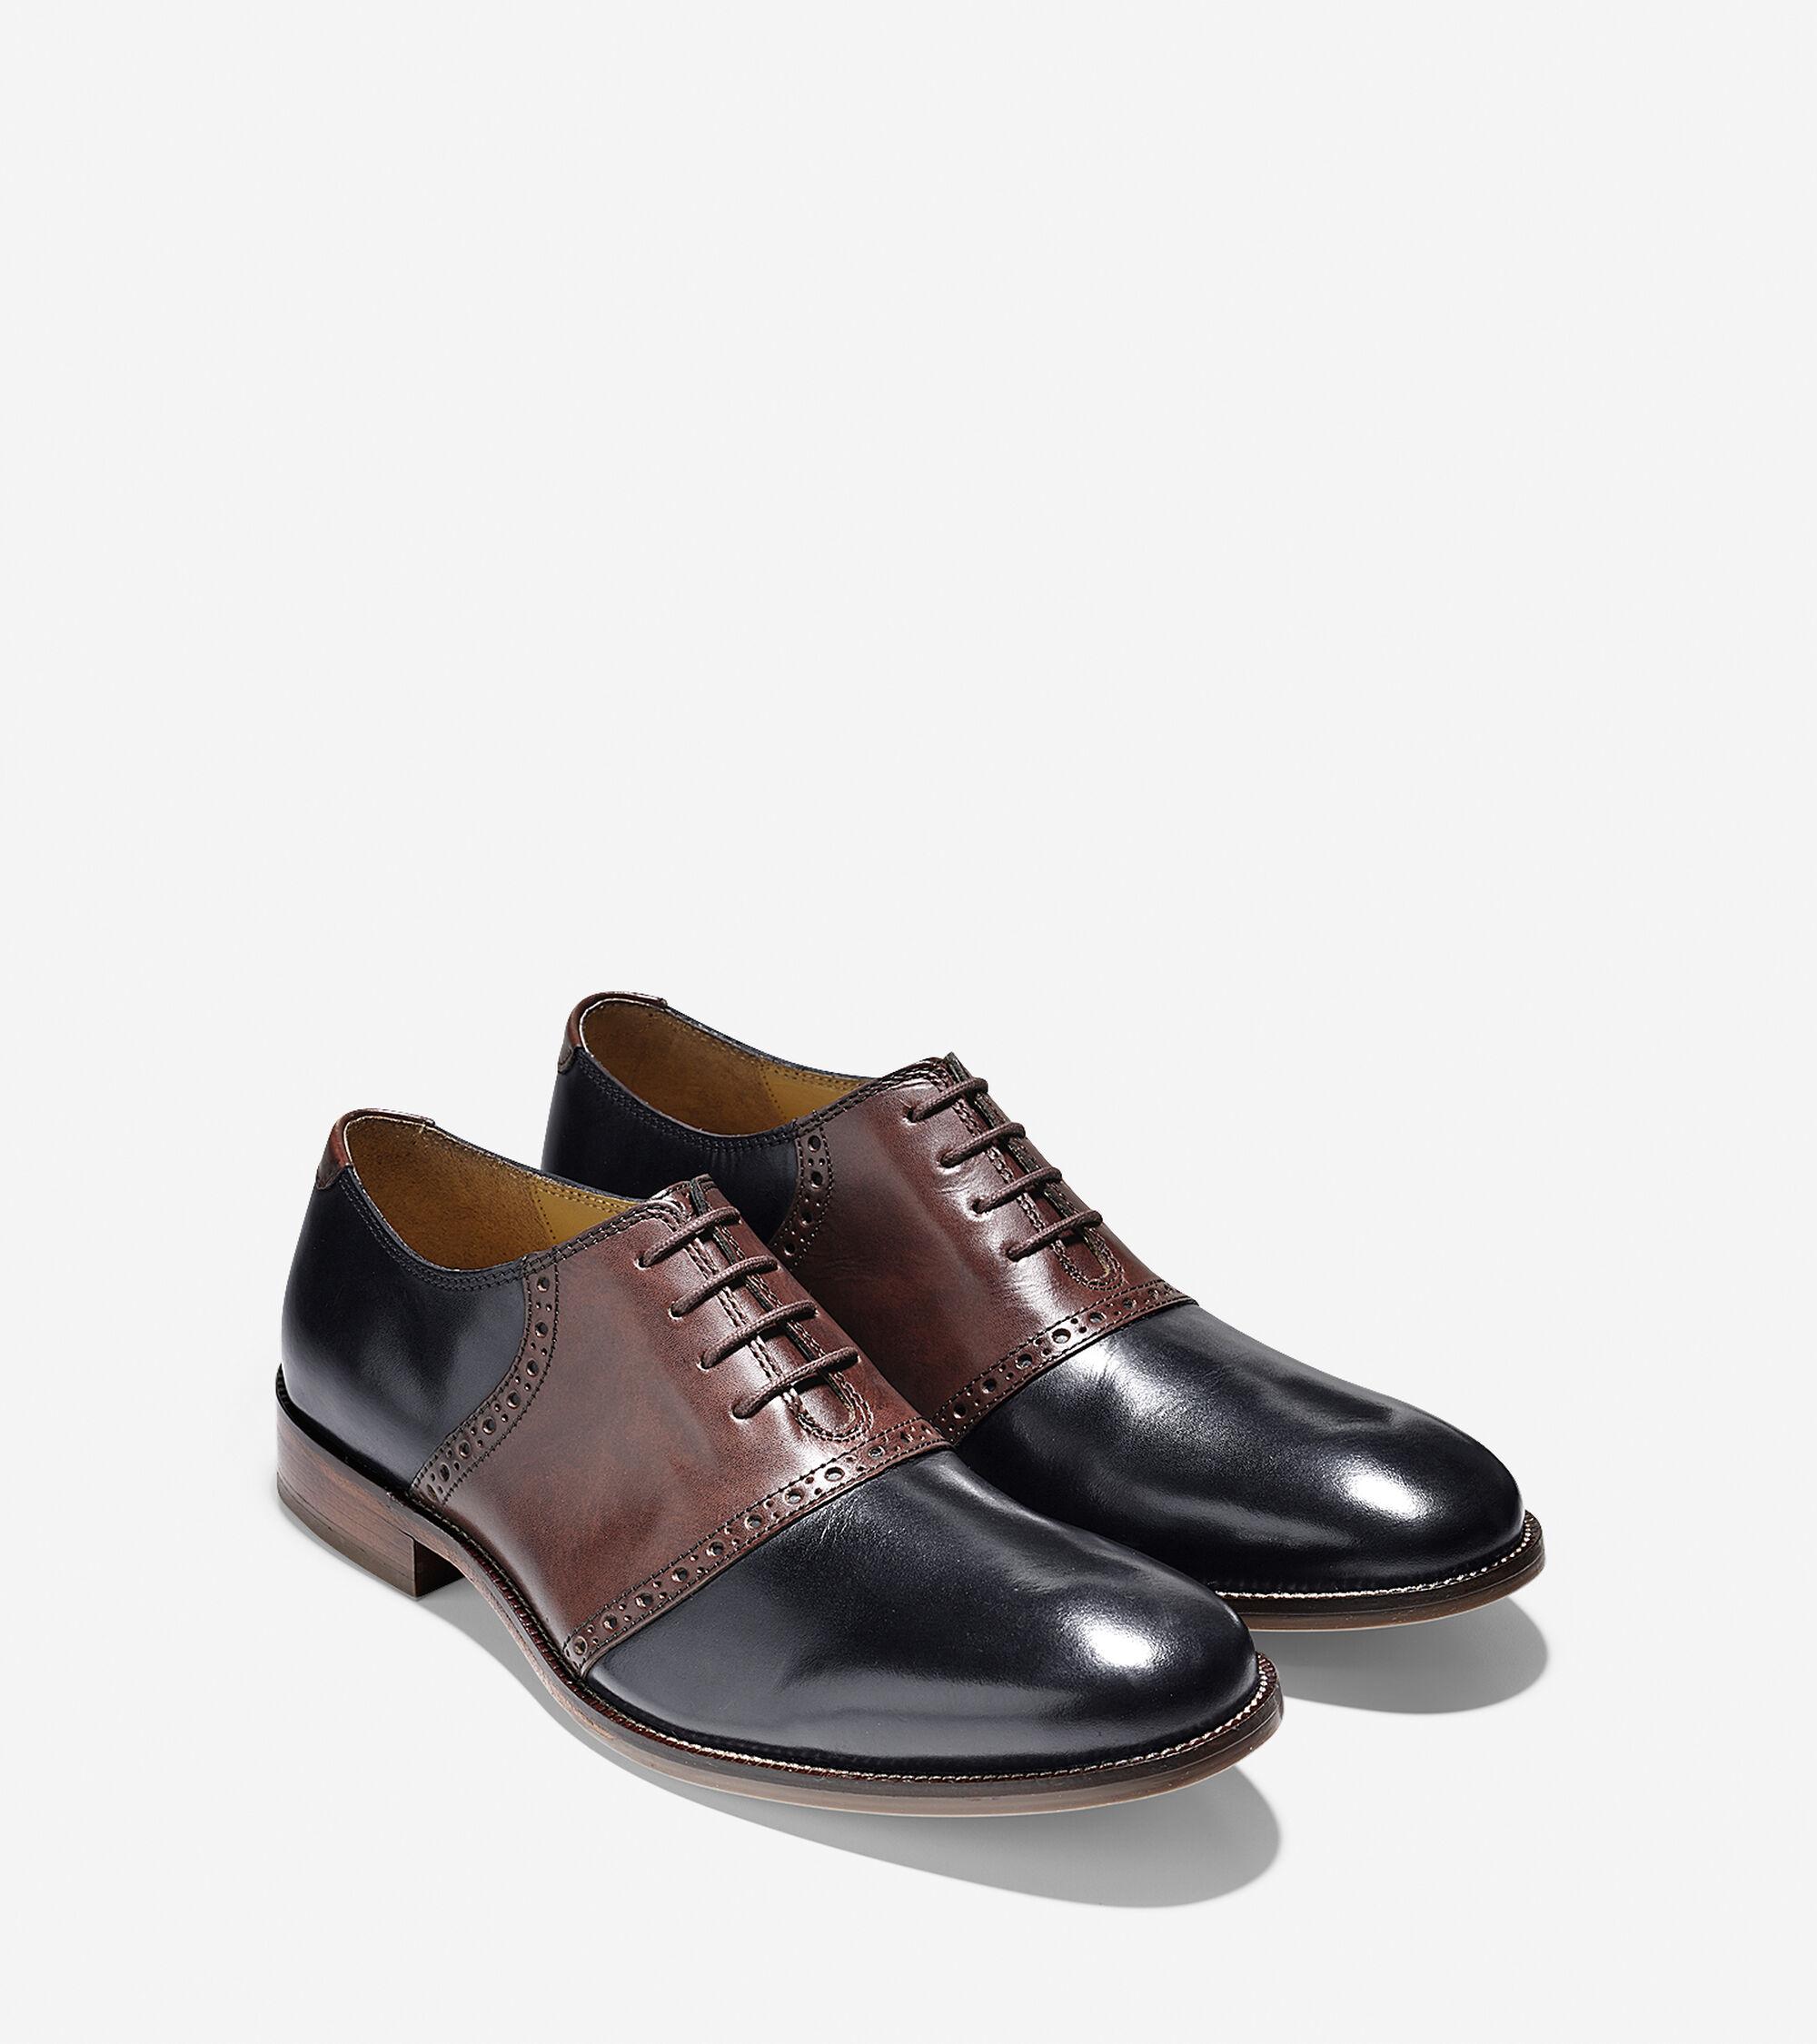 b0dd14039e3 Mens Leather Saddle Shoes - Image Of Shoes